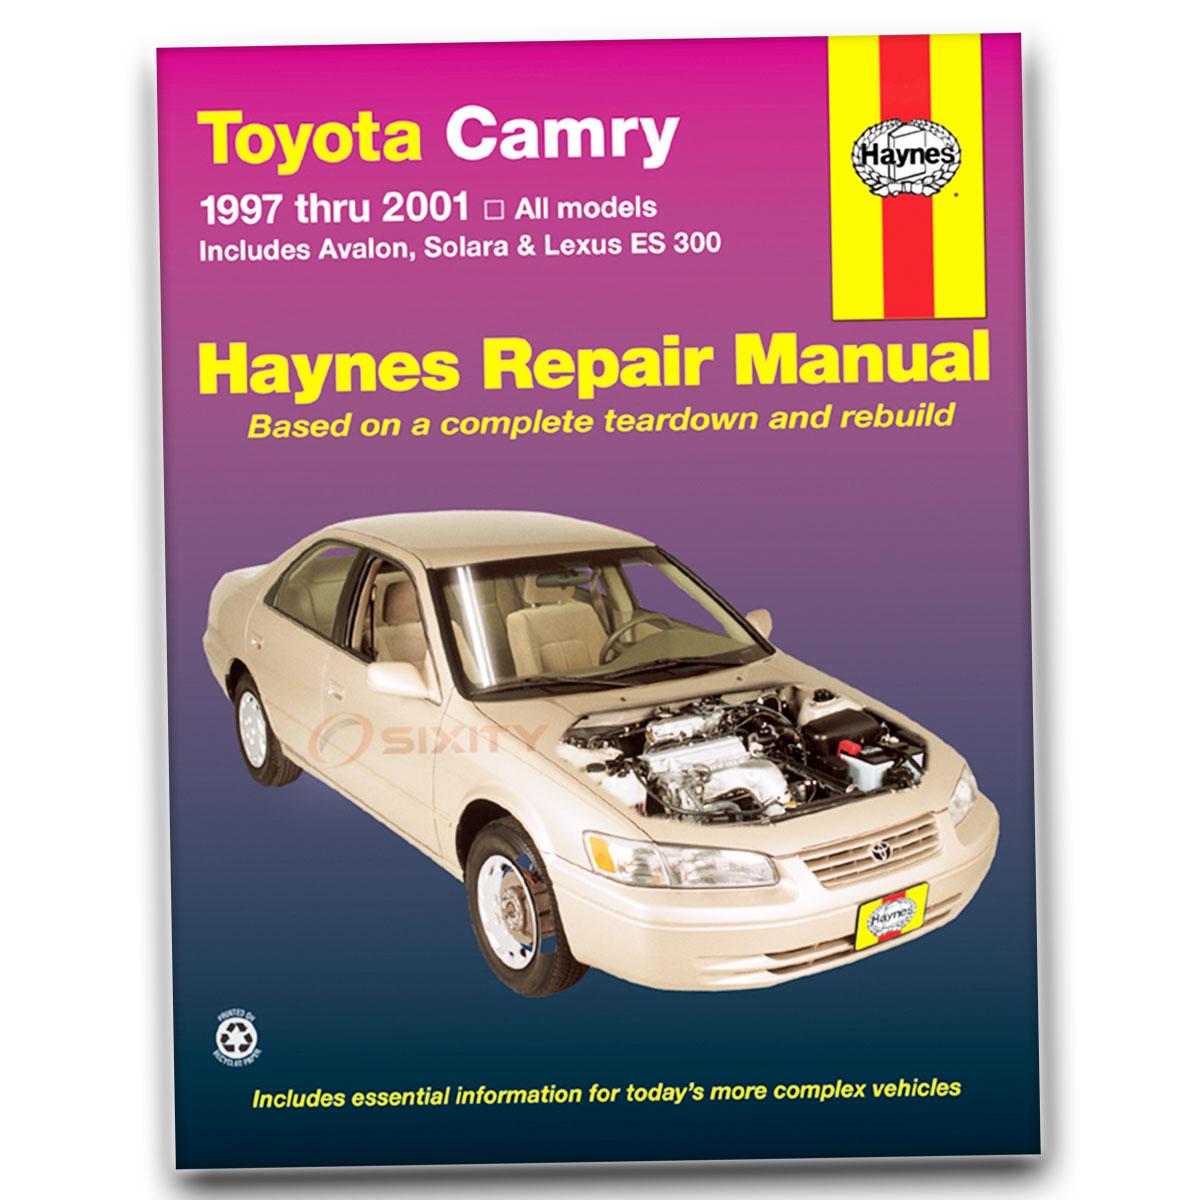 haynes toyota camry avalon solara lexus es 300 97 01 repair manual rh ebay com 2013 Toyota Camry Replacement Body Parts Diagram Toyota Camry Electrical Wiring Diagram